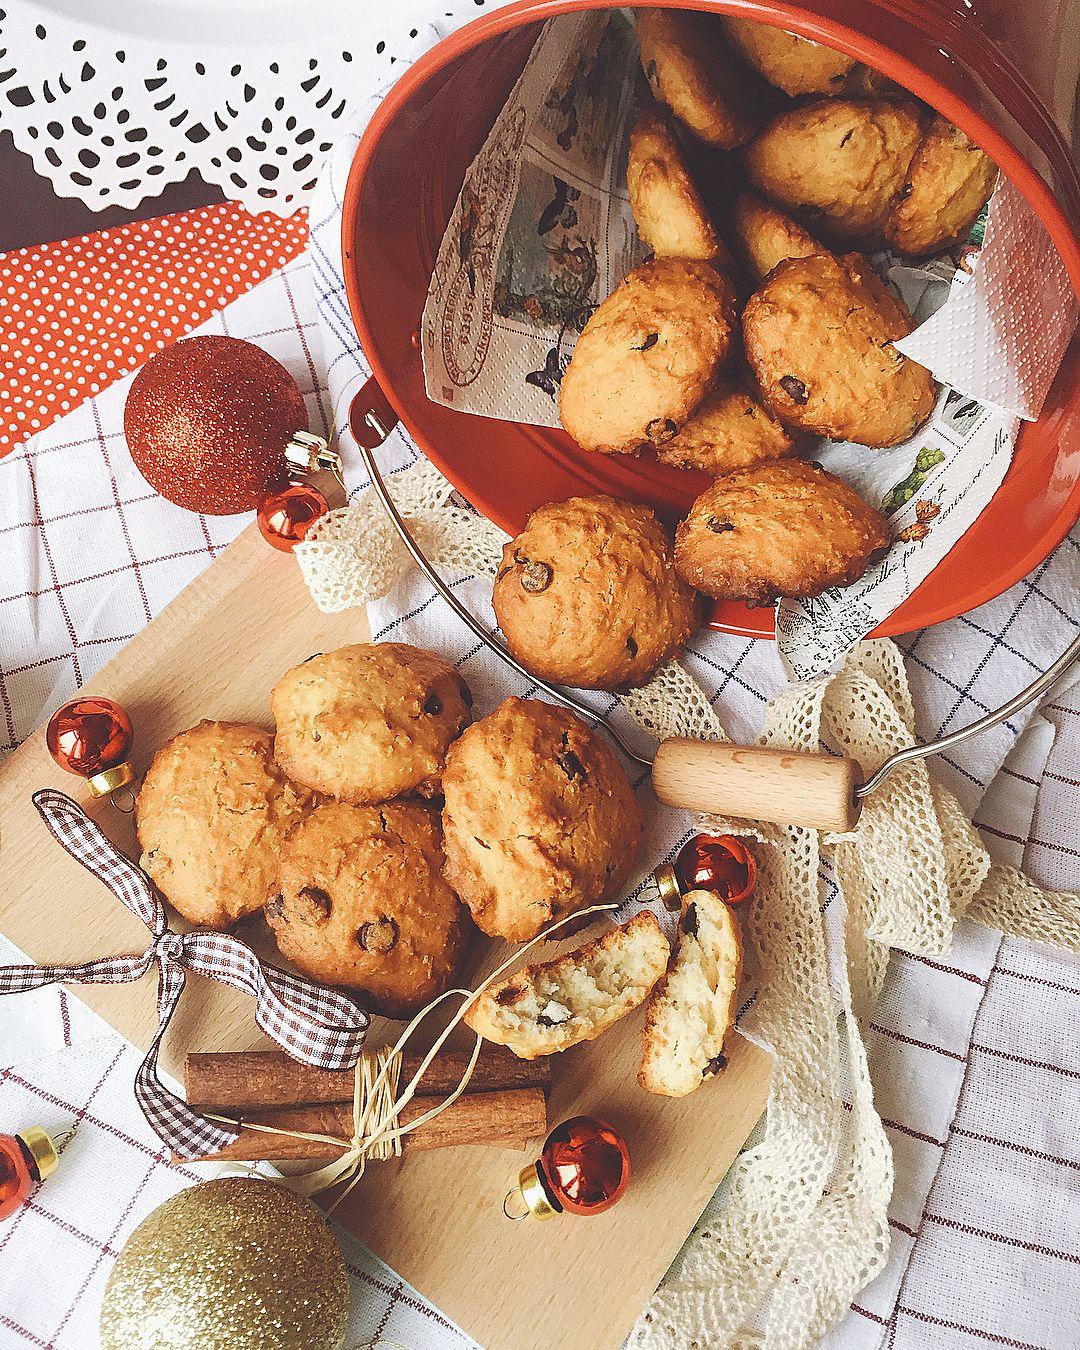 "Tanya Gardzheva on Instagram: ""Продължението на бисквитената серия е кокосово с шоколадов чипс 👌🍪😋🎄#itsthemostwonderfultimeoftheyear #christmas #christmasiscoming…"""